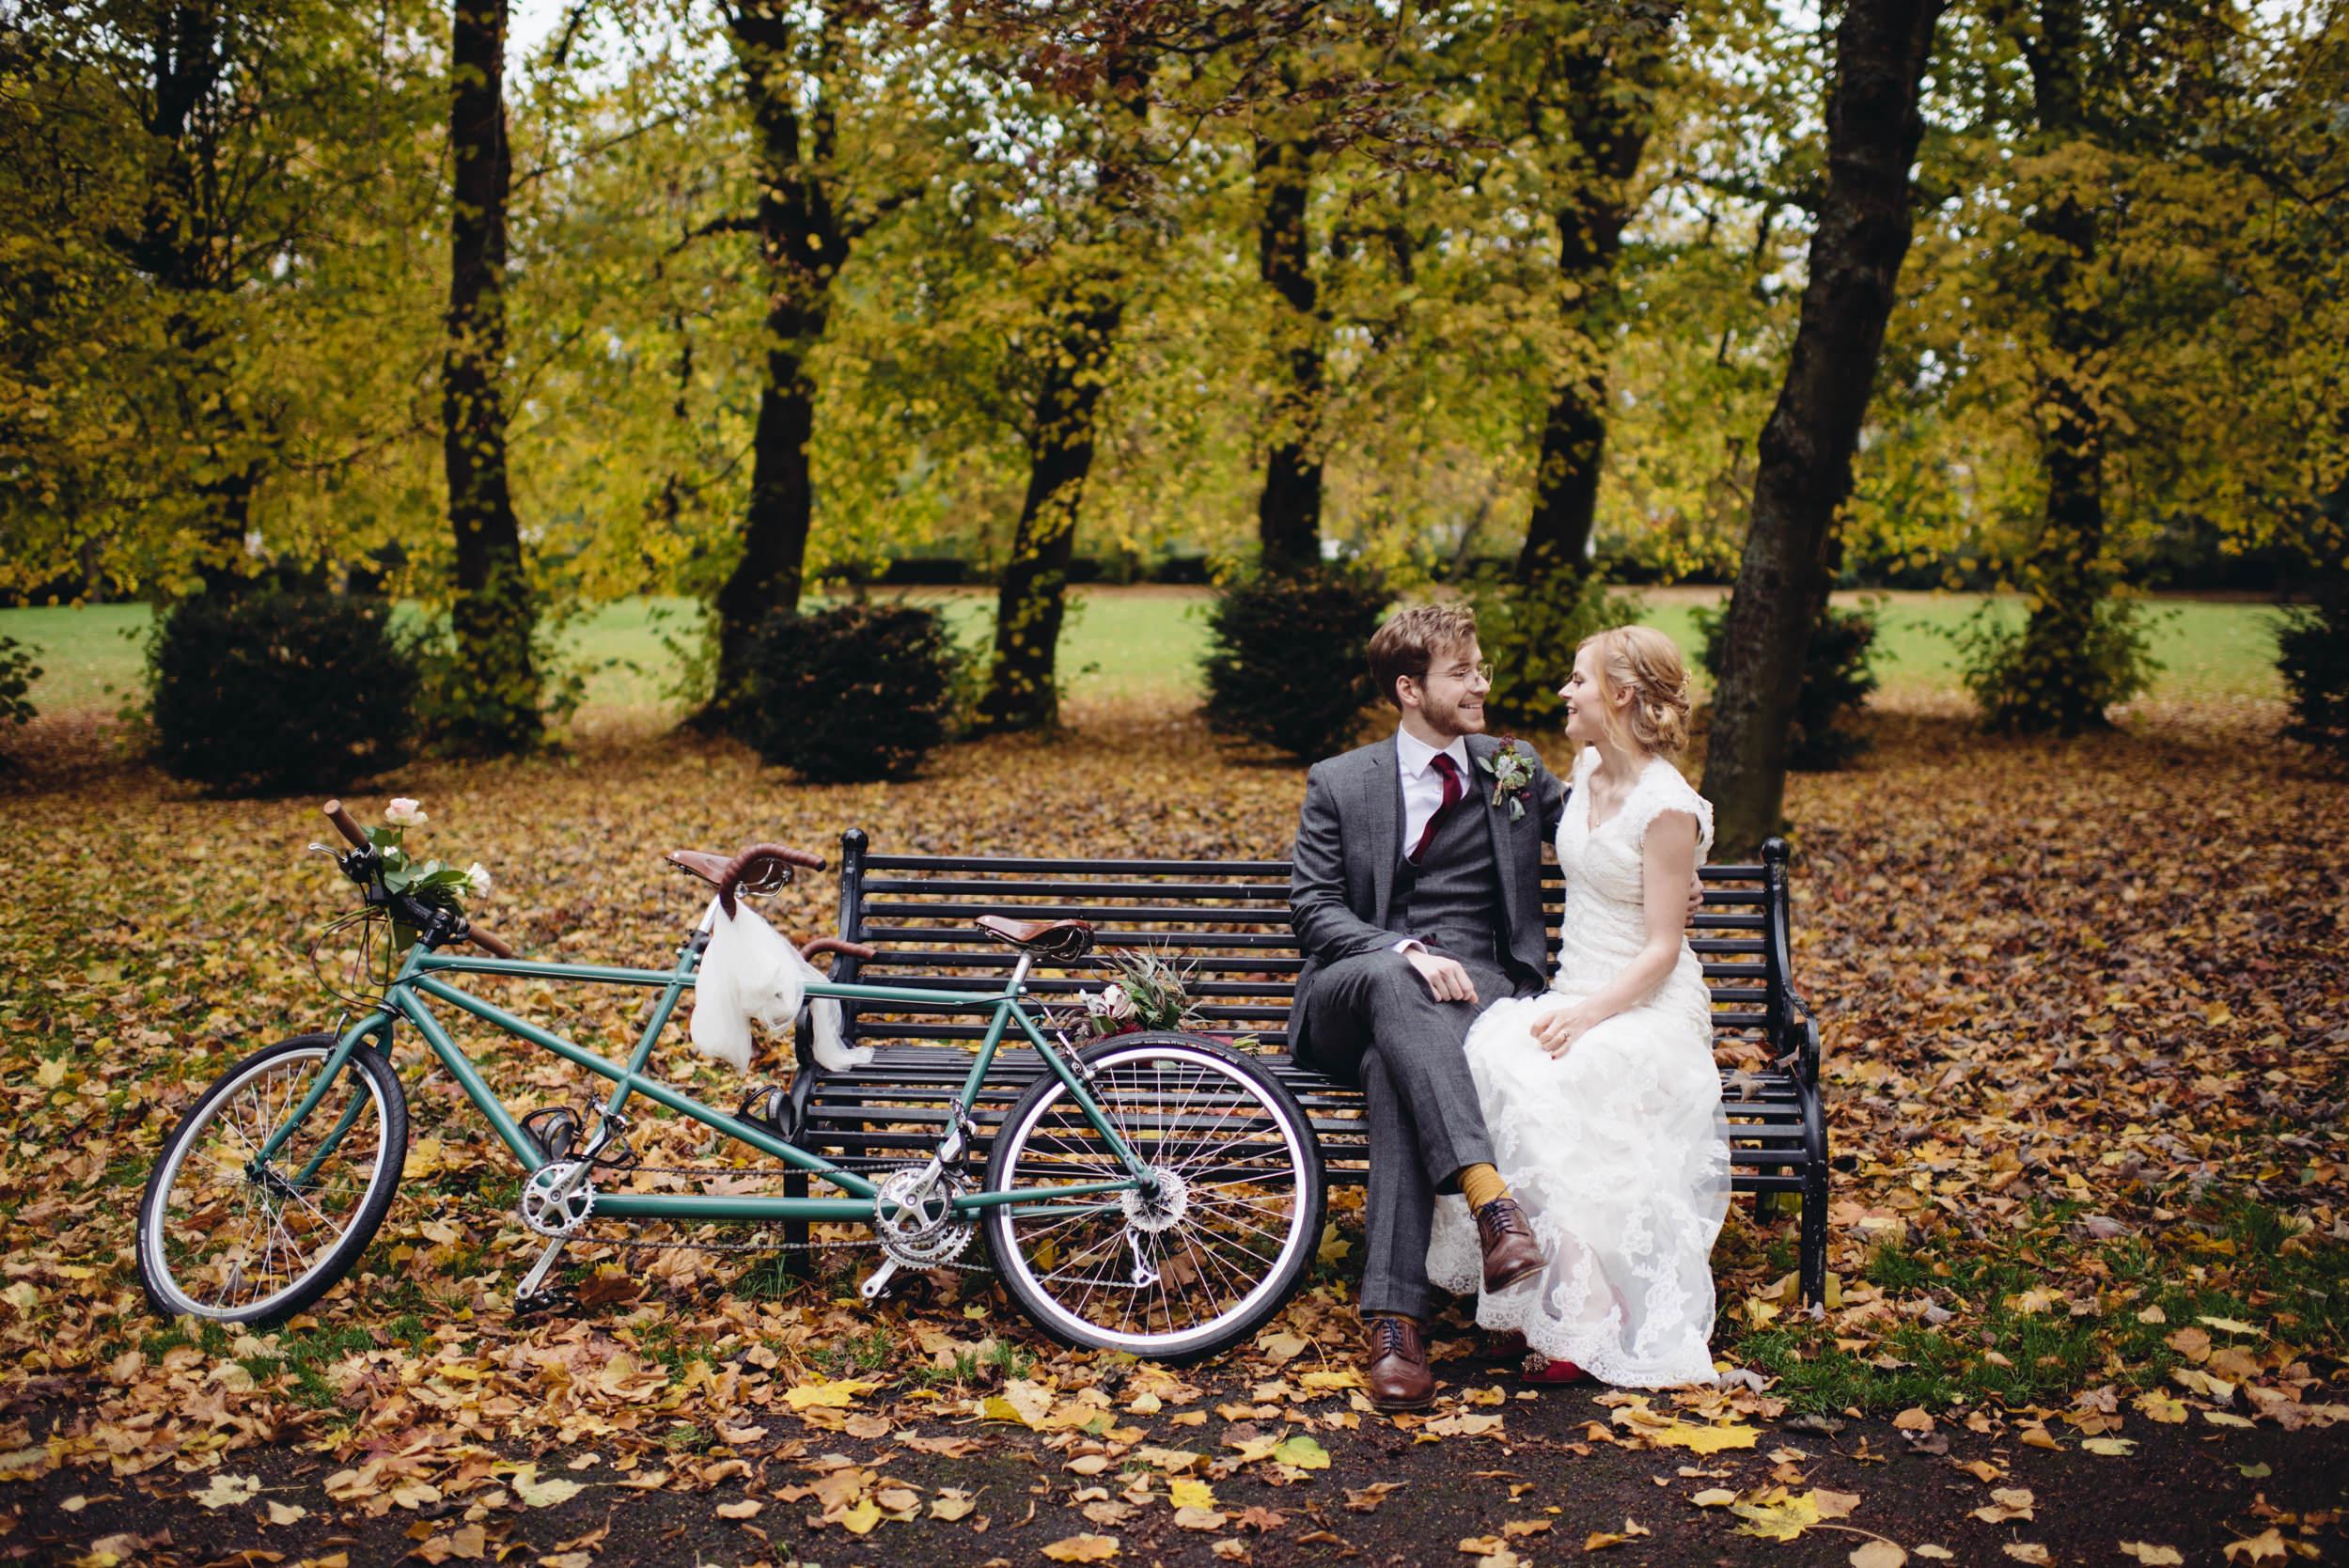 0119-alternative-wedding-portrait-family-kids-photographer-glasgow-scotland.JPG